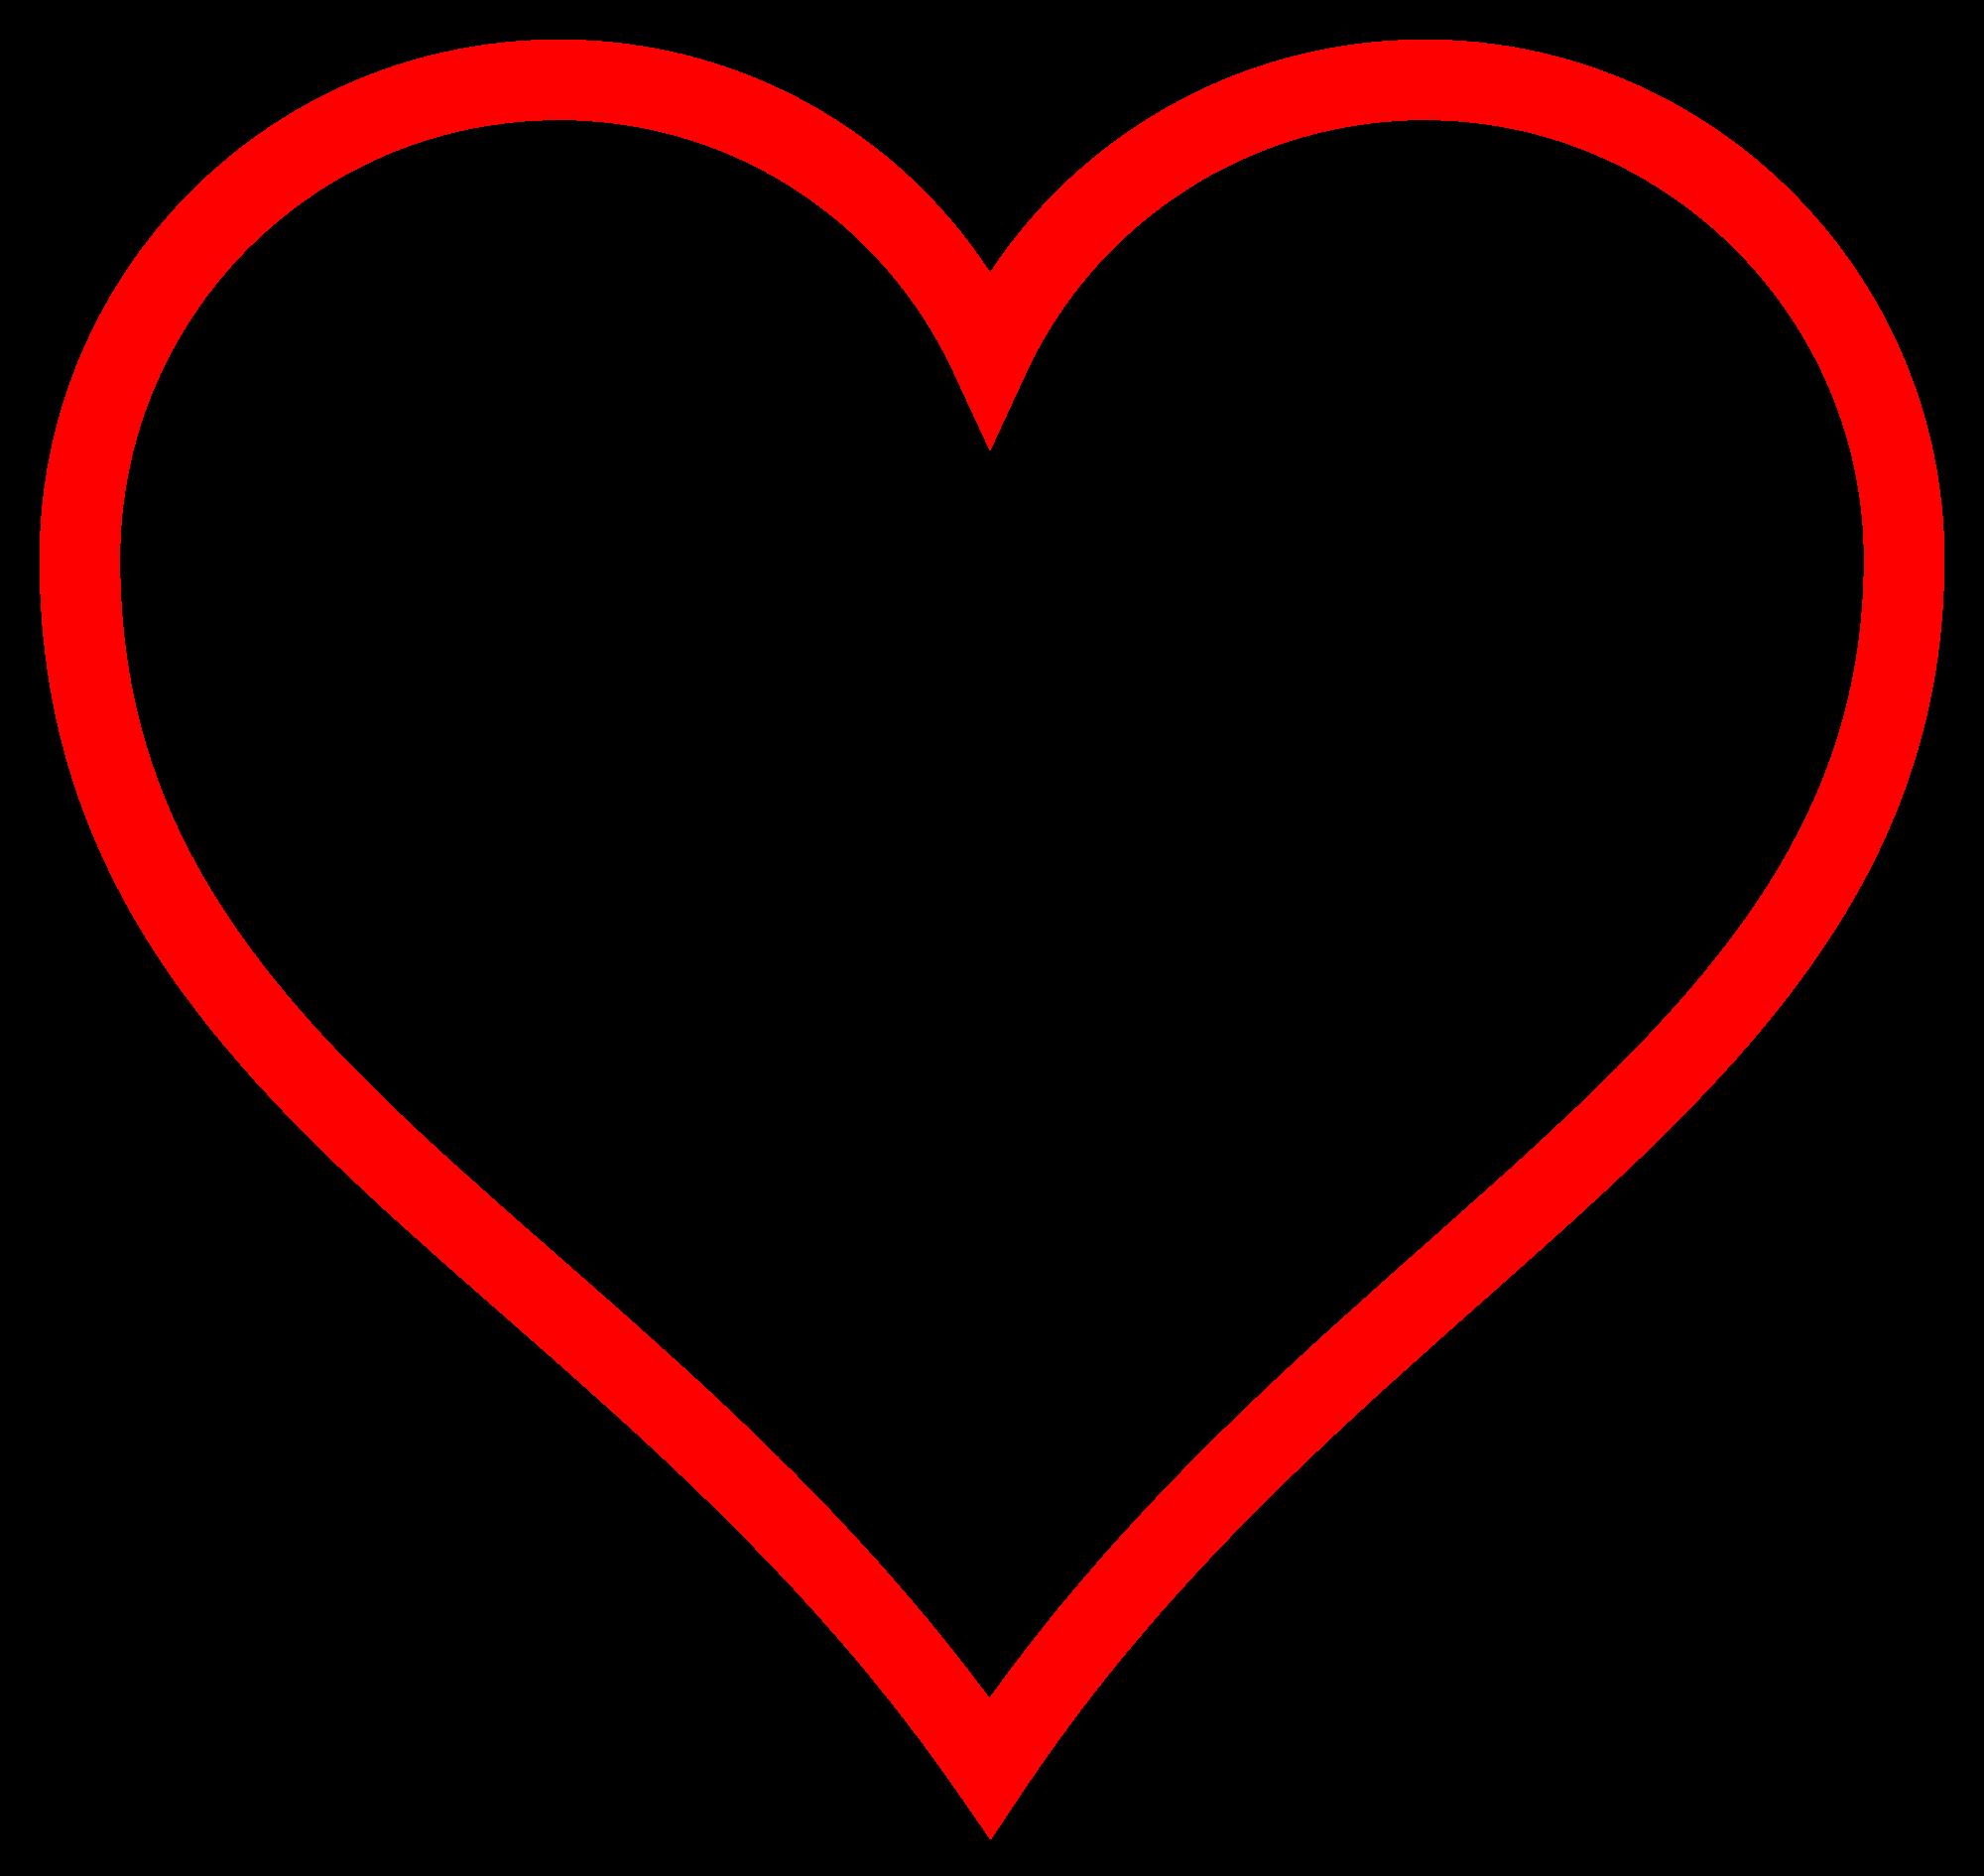 Heart-shaped clipart open heart #14